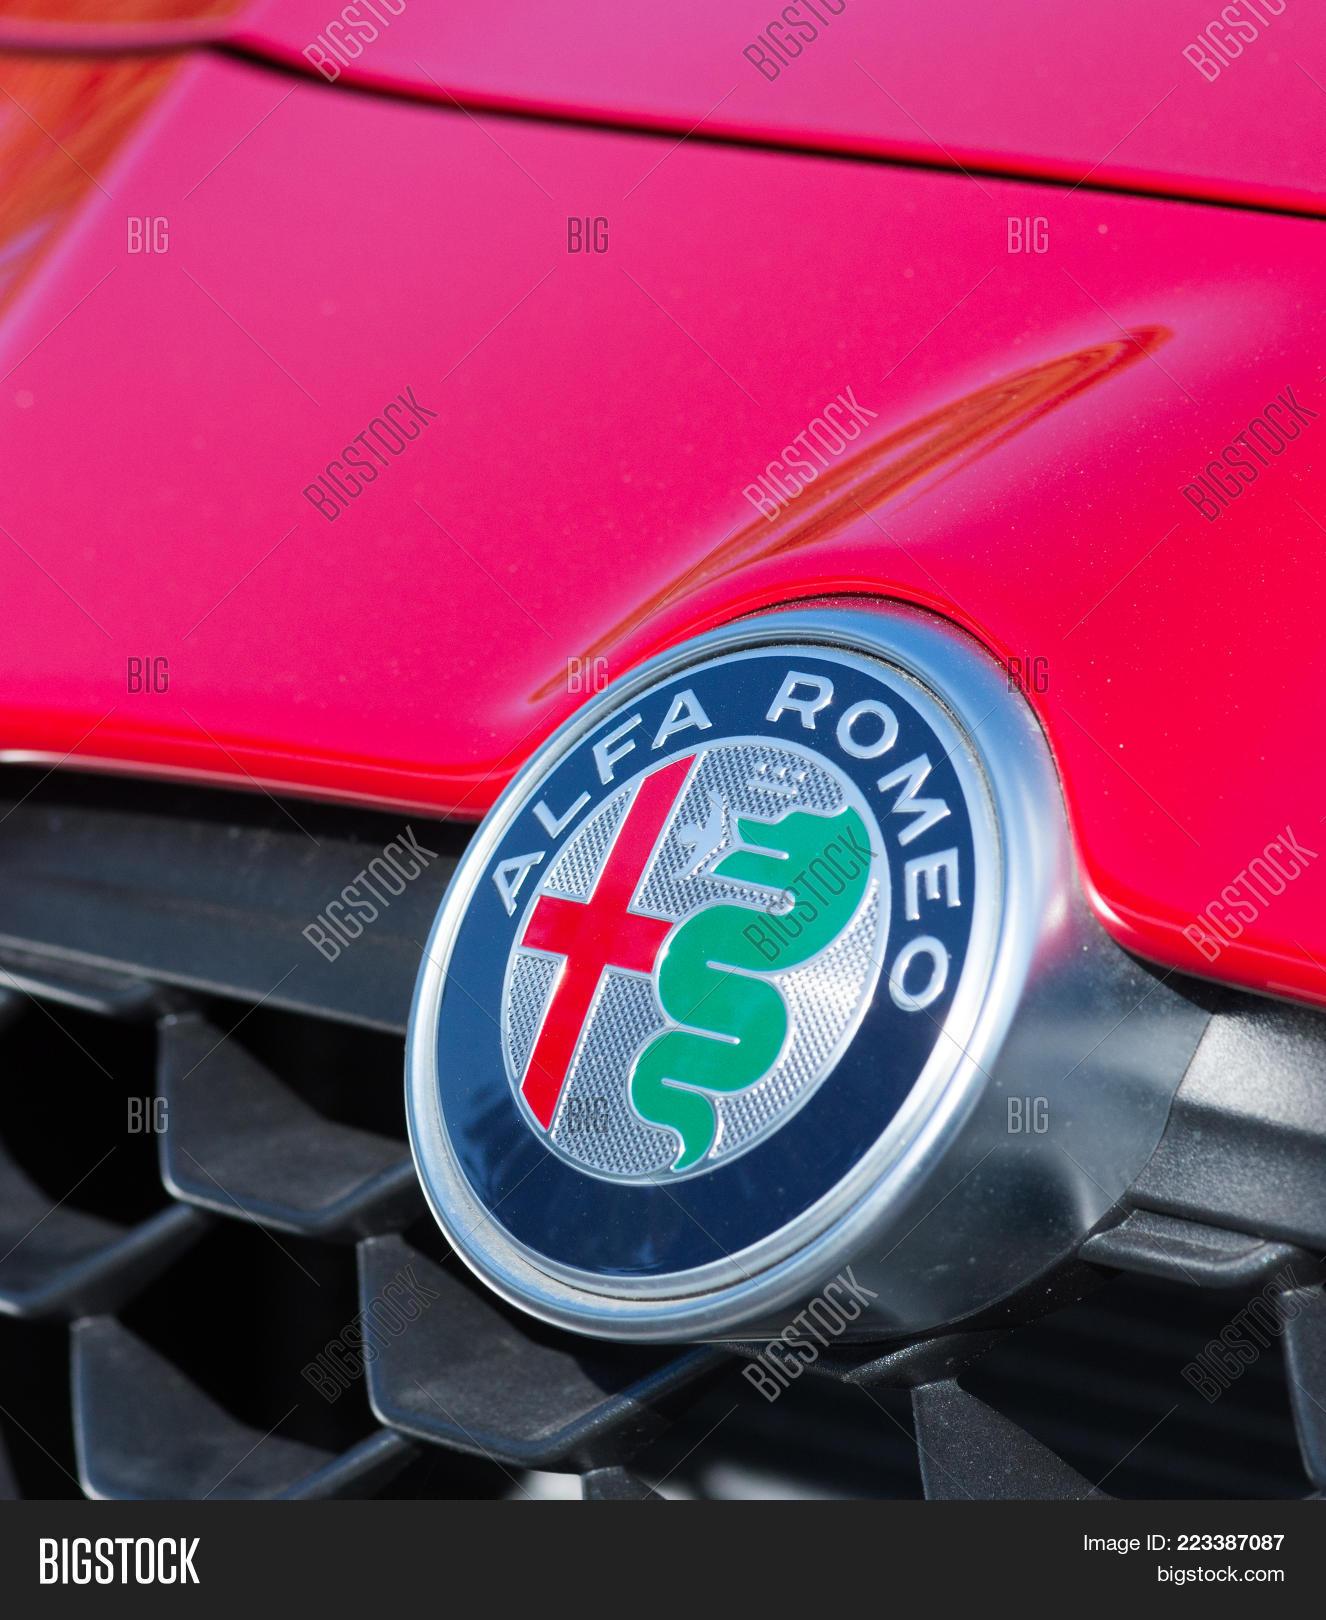 Romania September 2 Image Photo Free Trial Bigstock Alfa Romeo Symbol 2017 Logo On In